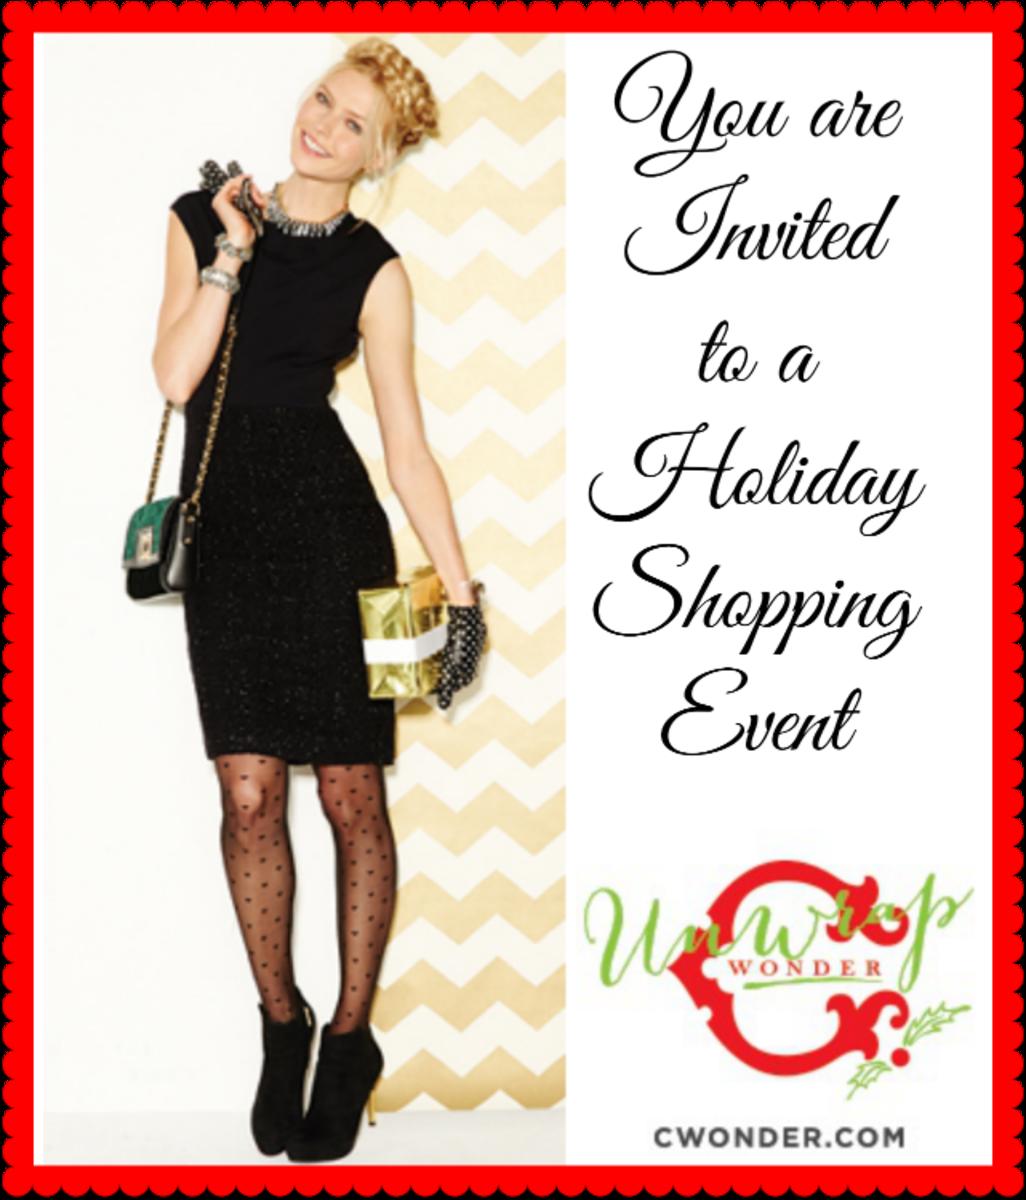 C.Wonder Shopping Event